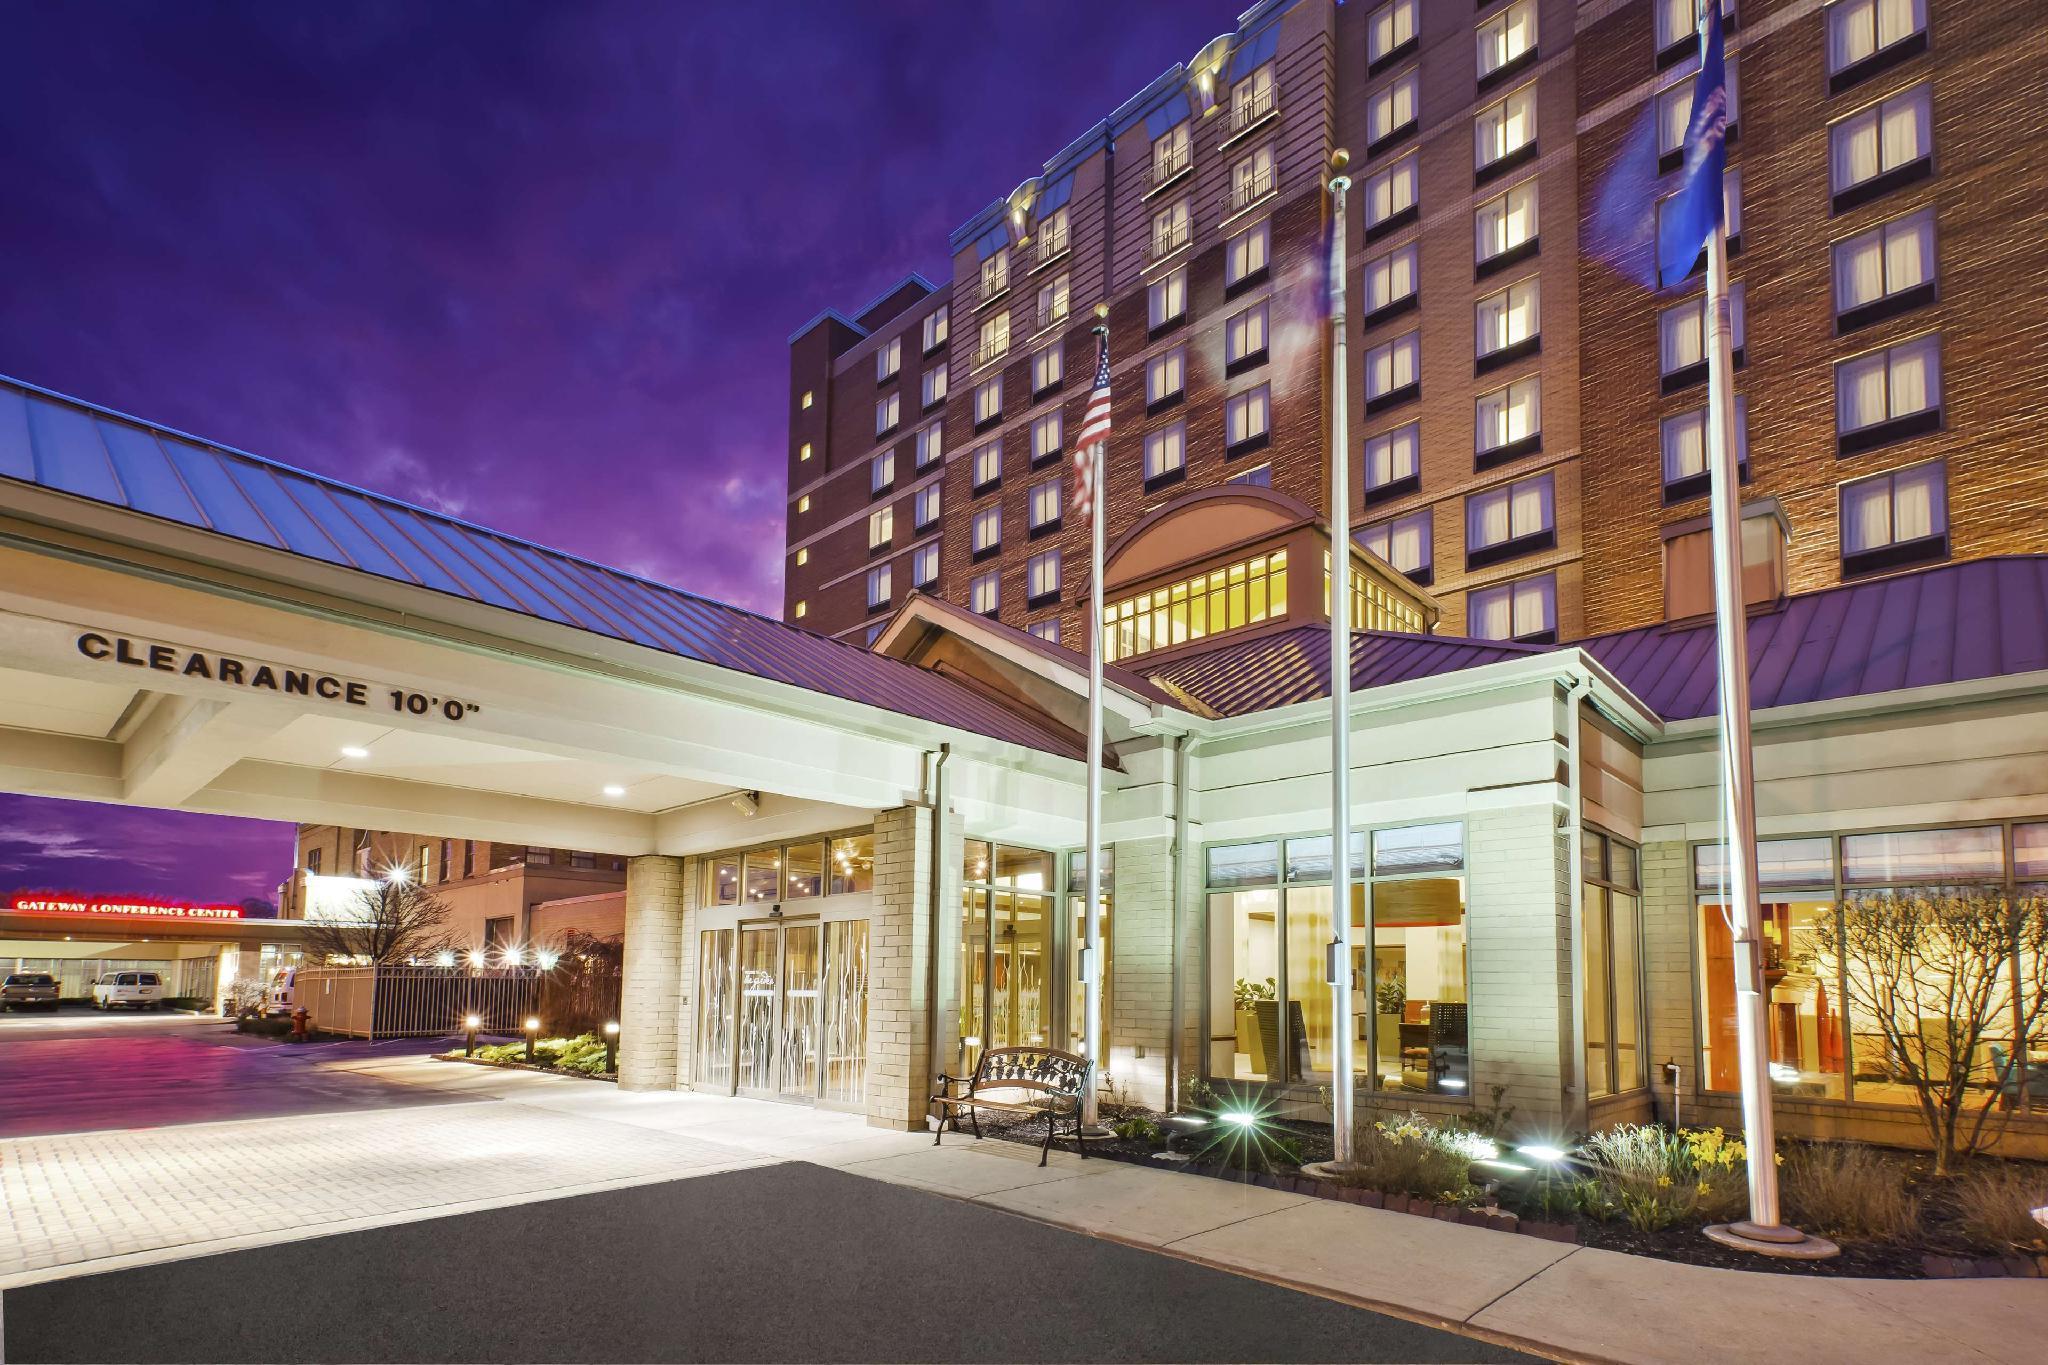 Hilton Garden Inn Cleveland Downtown Hotel